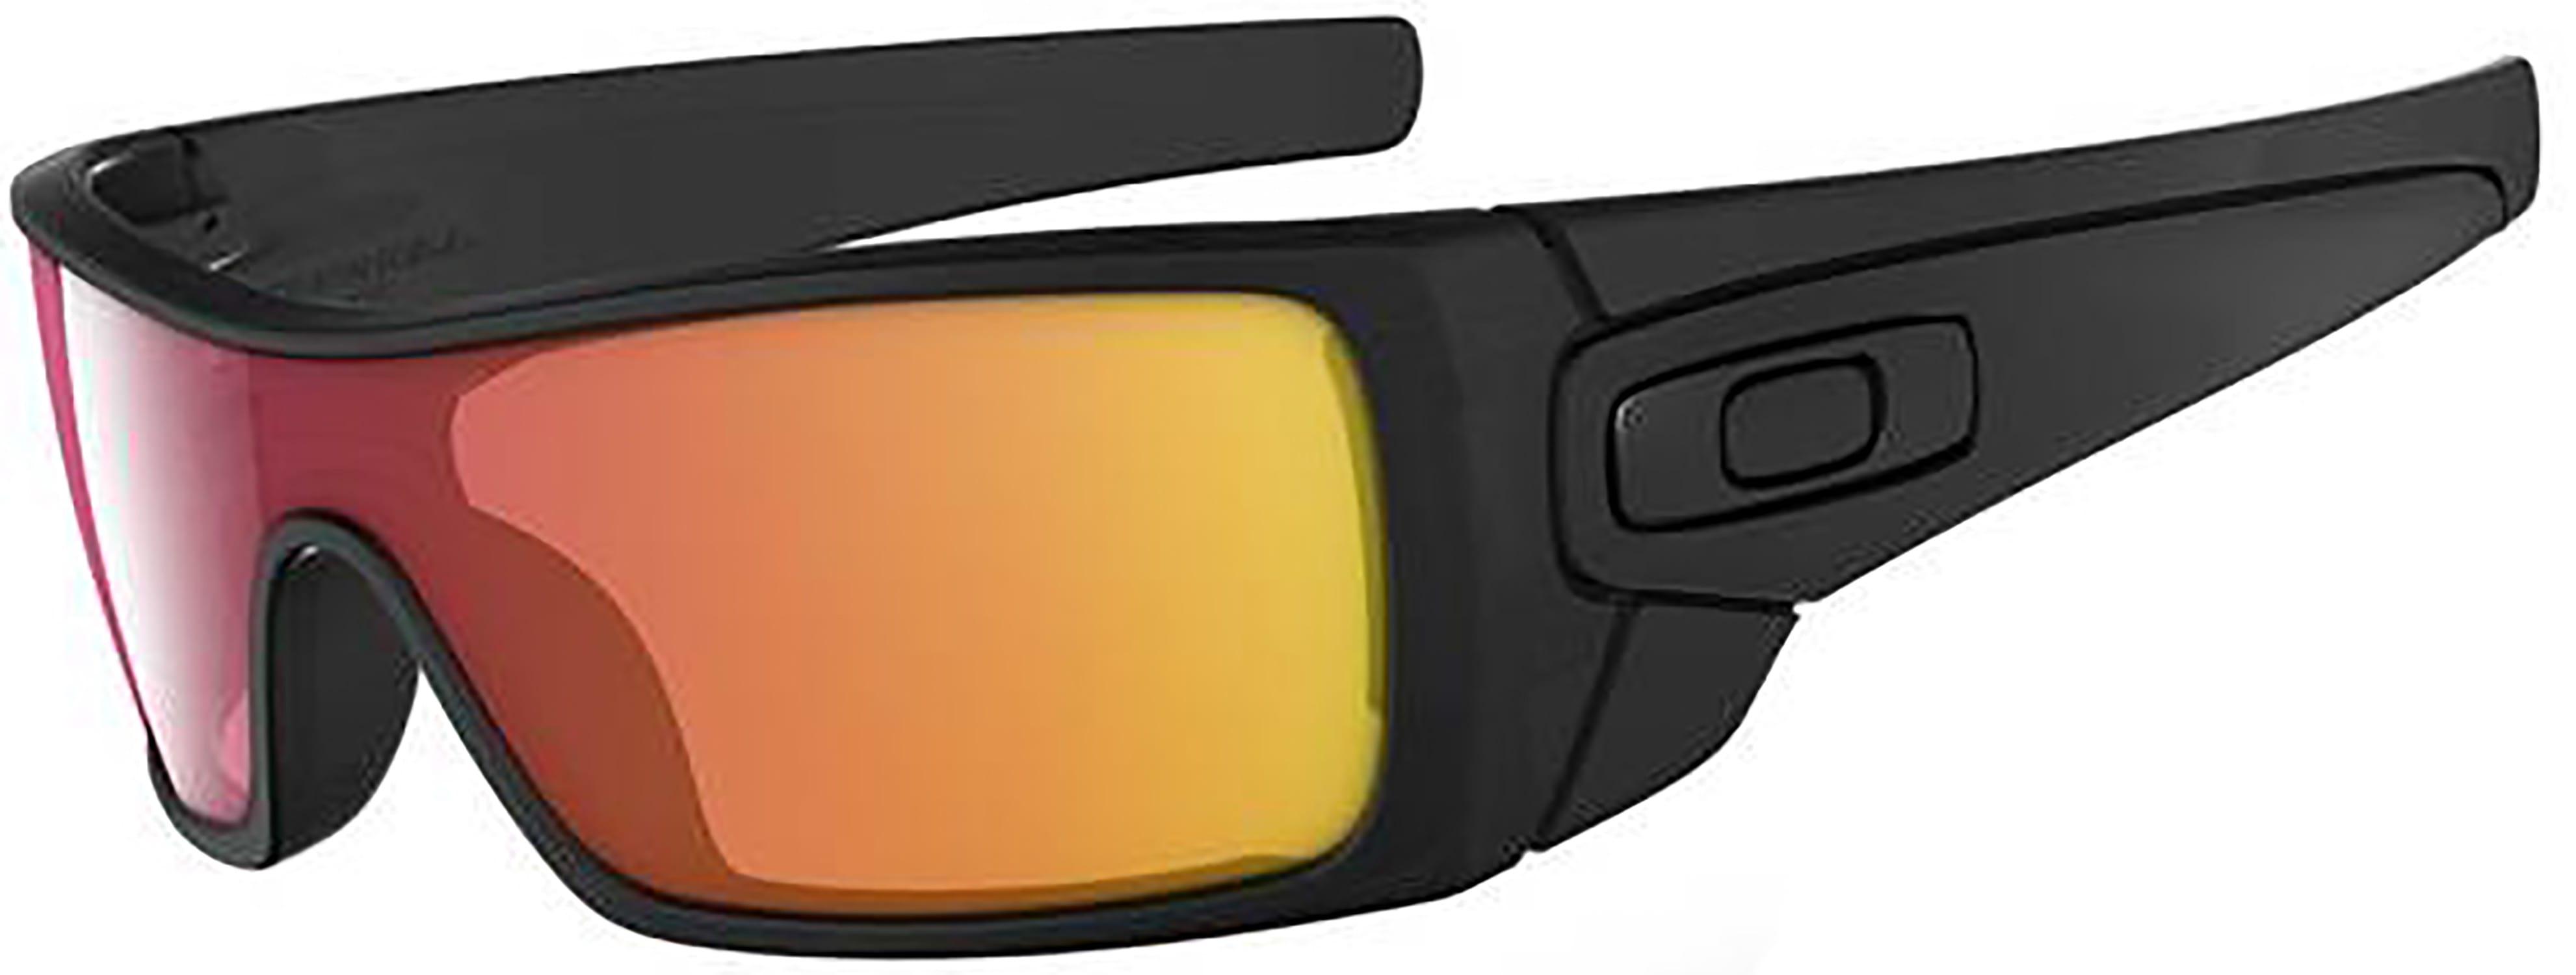 Bat Wolf Oakley Sunglasses